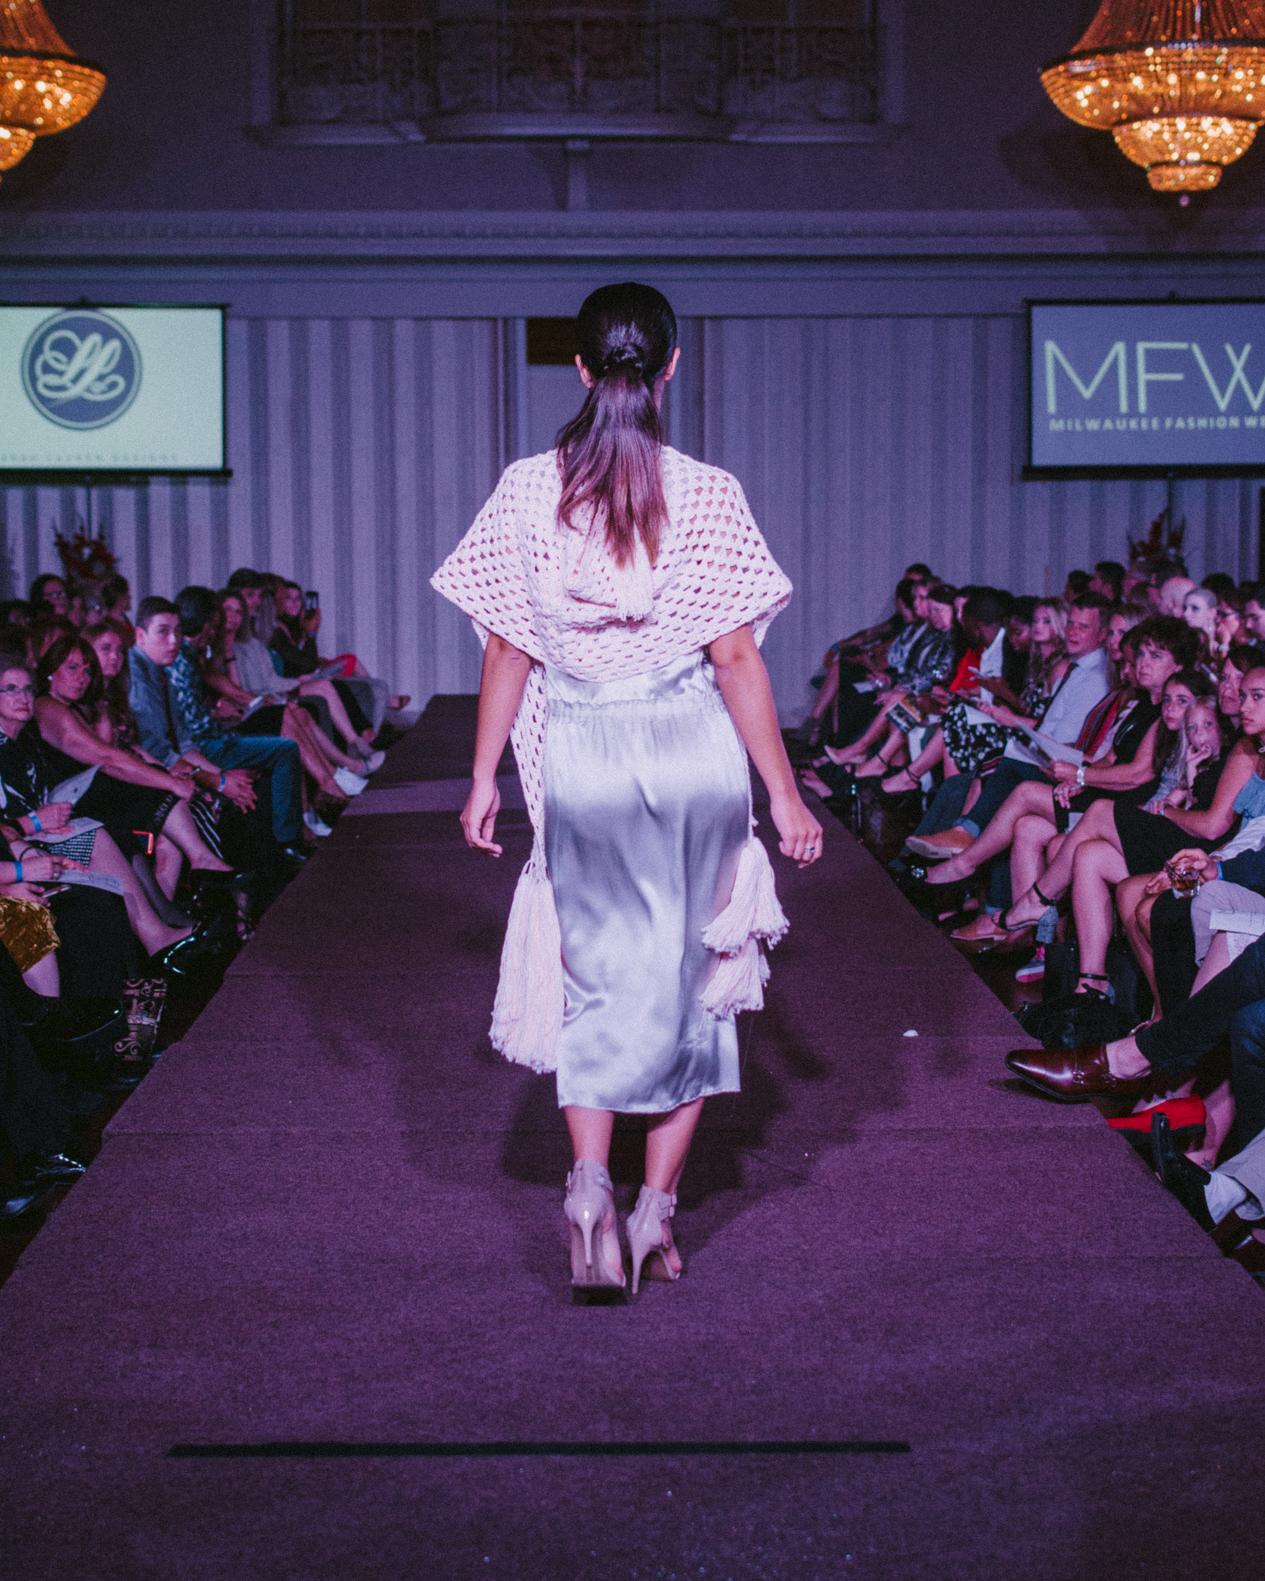 MFW_2017-09-23-7.jpg